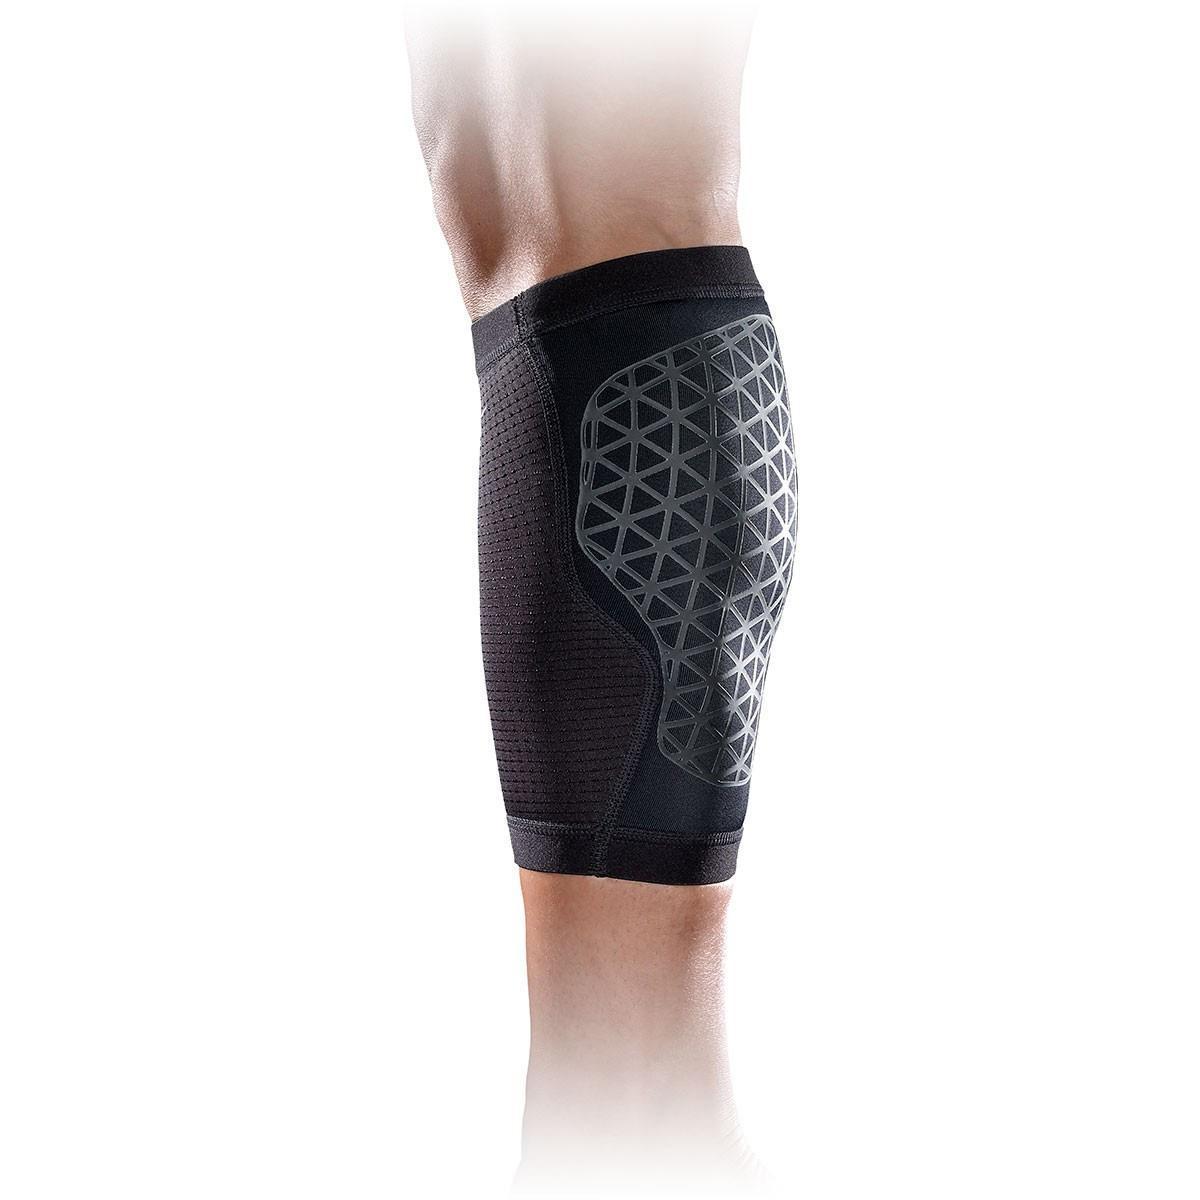 quality design 81f39 368f6 Nike Pro Combat Hyperstrong Calf Sleeve - Black - Tennisnuts